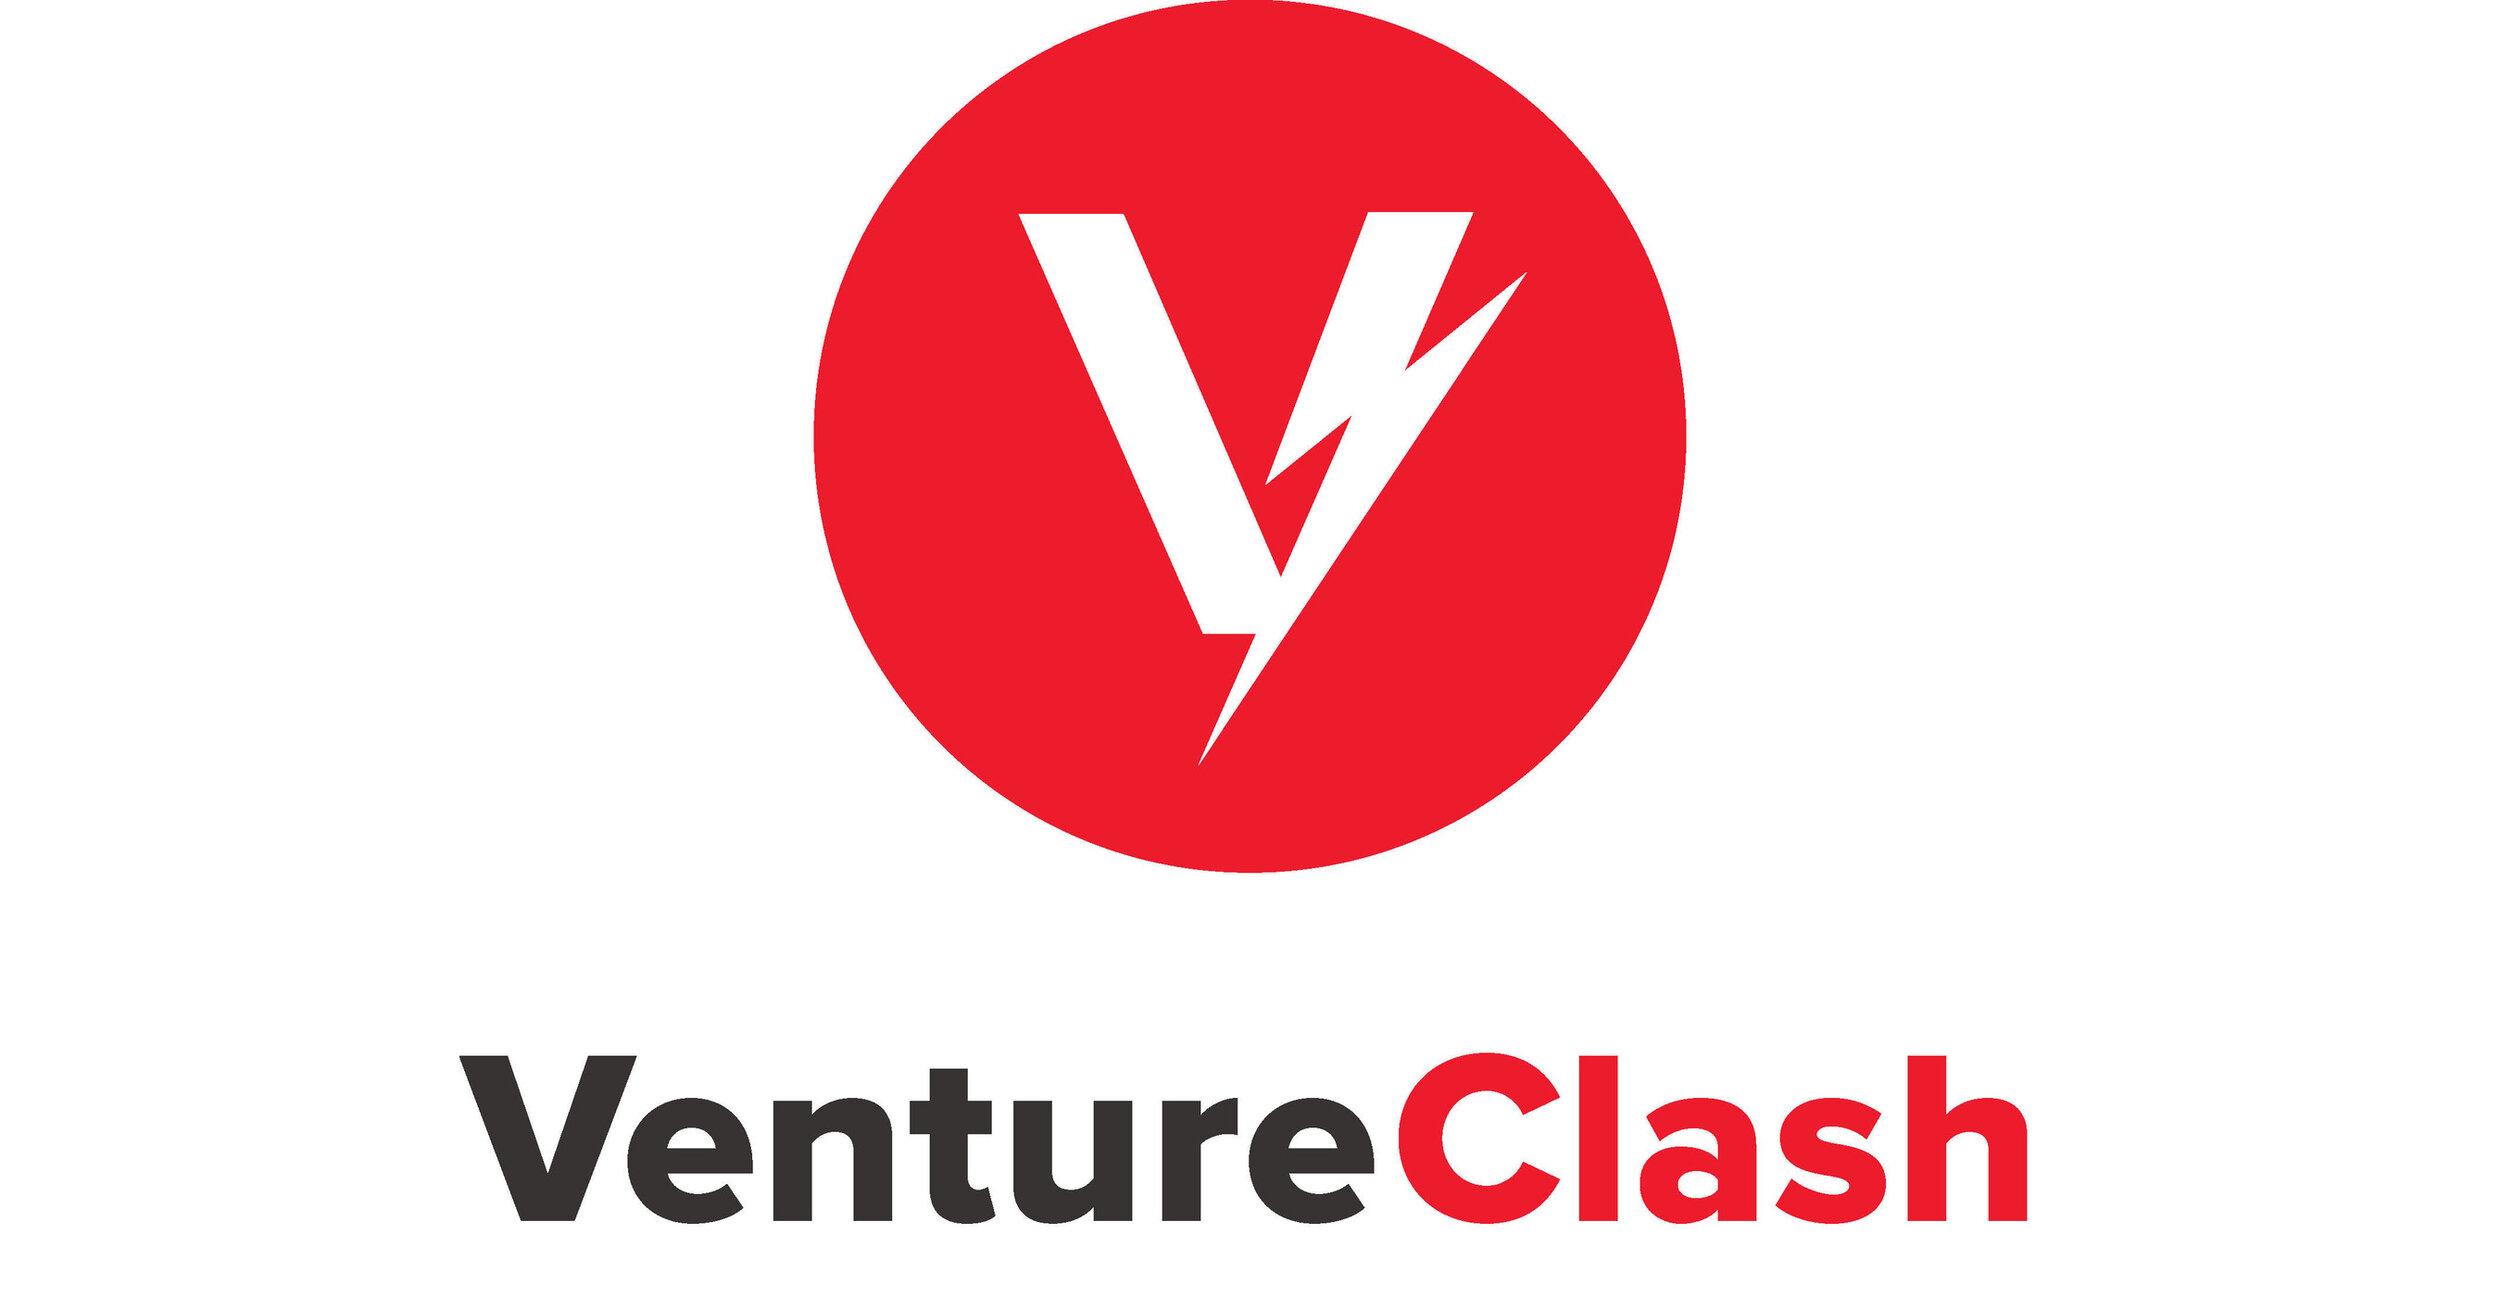 VentureClash.jpeg